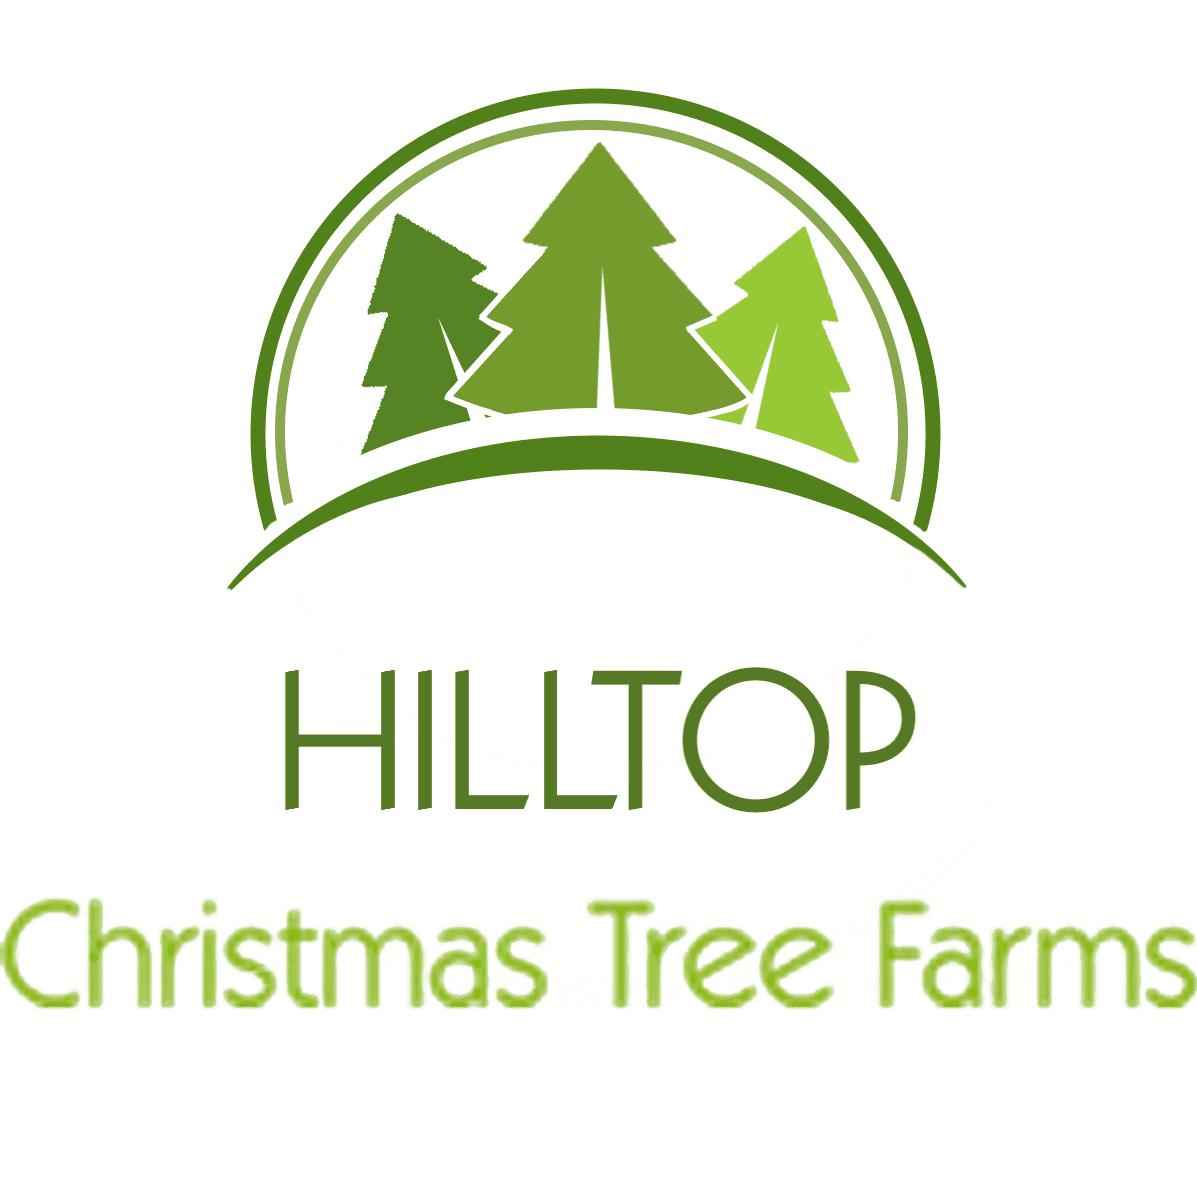 hilltop christmas tree farms crunchbase - Hilltop Christmas